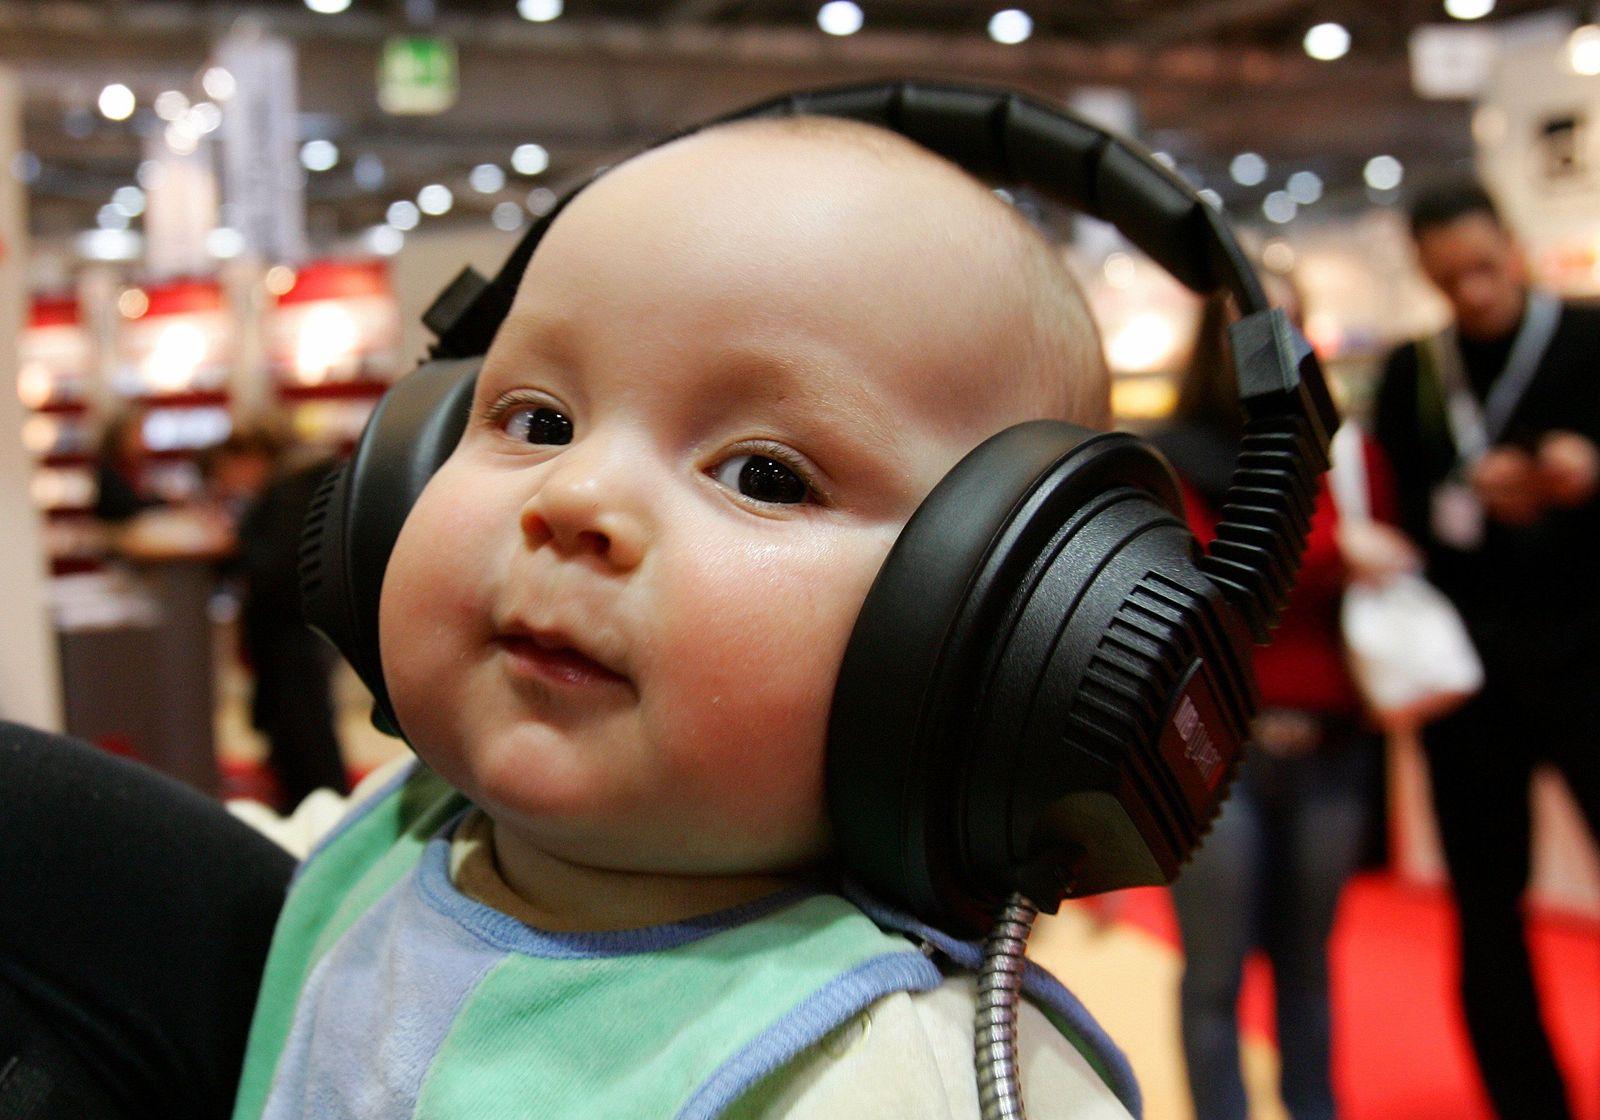 Kleinkind/Kopfhörer